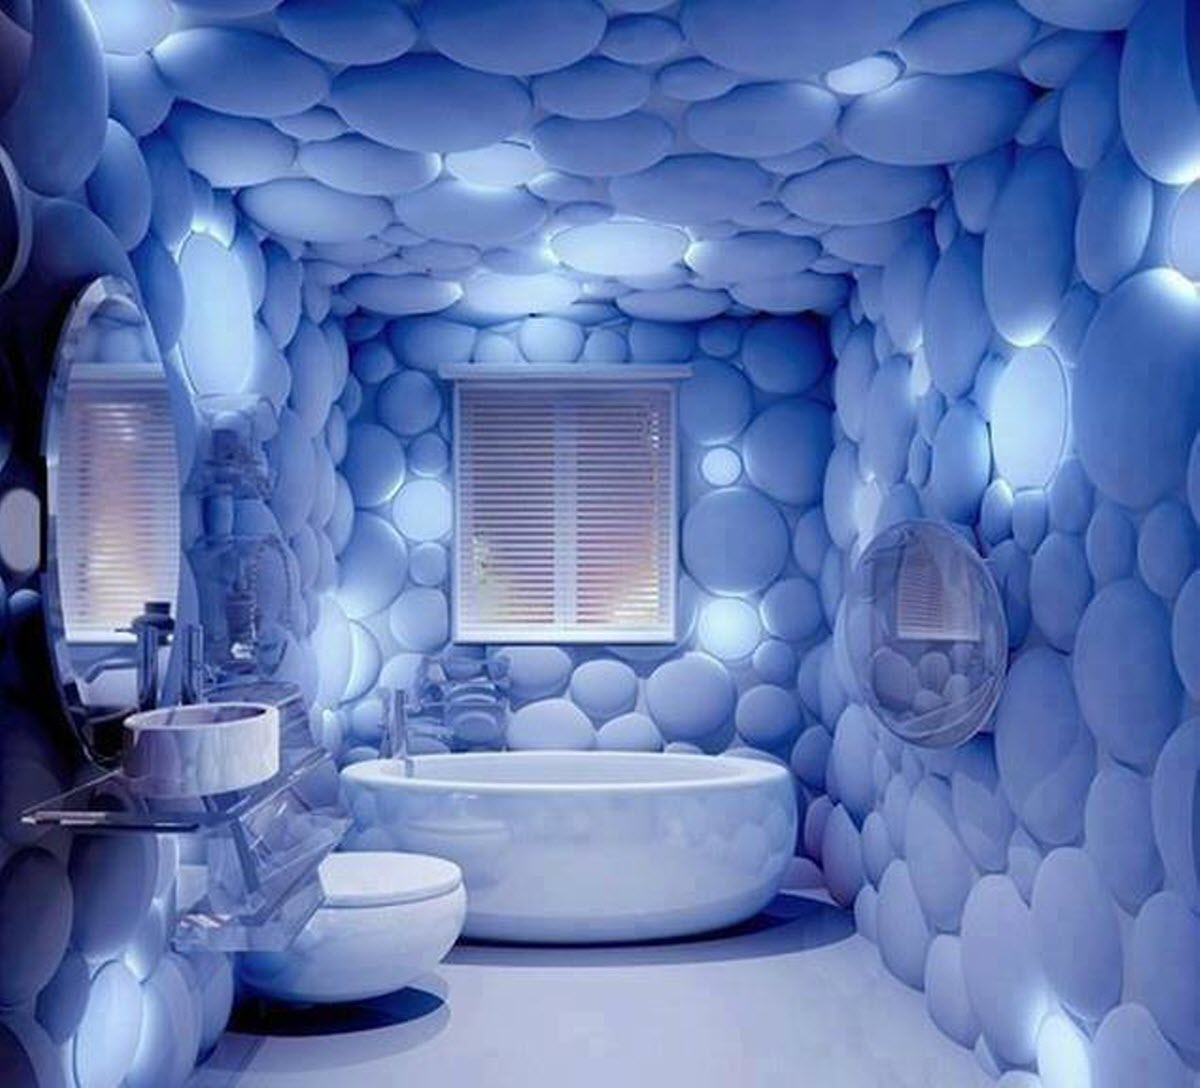 wallpaper for bathrooms ideas